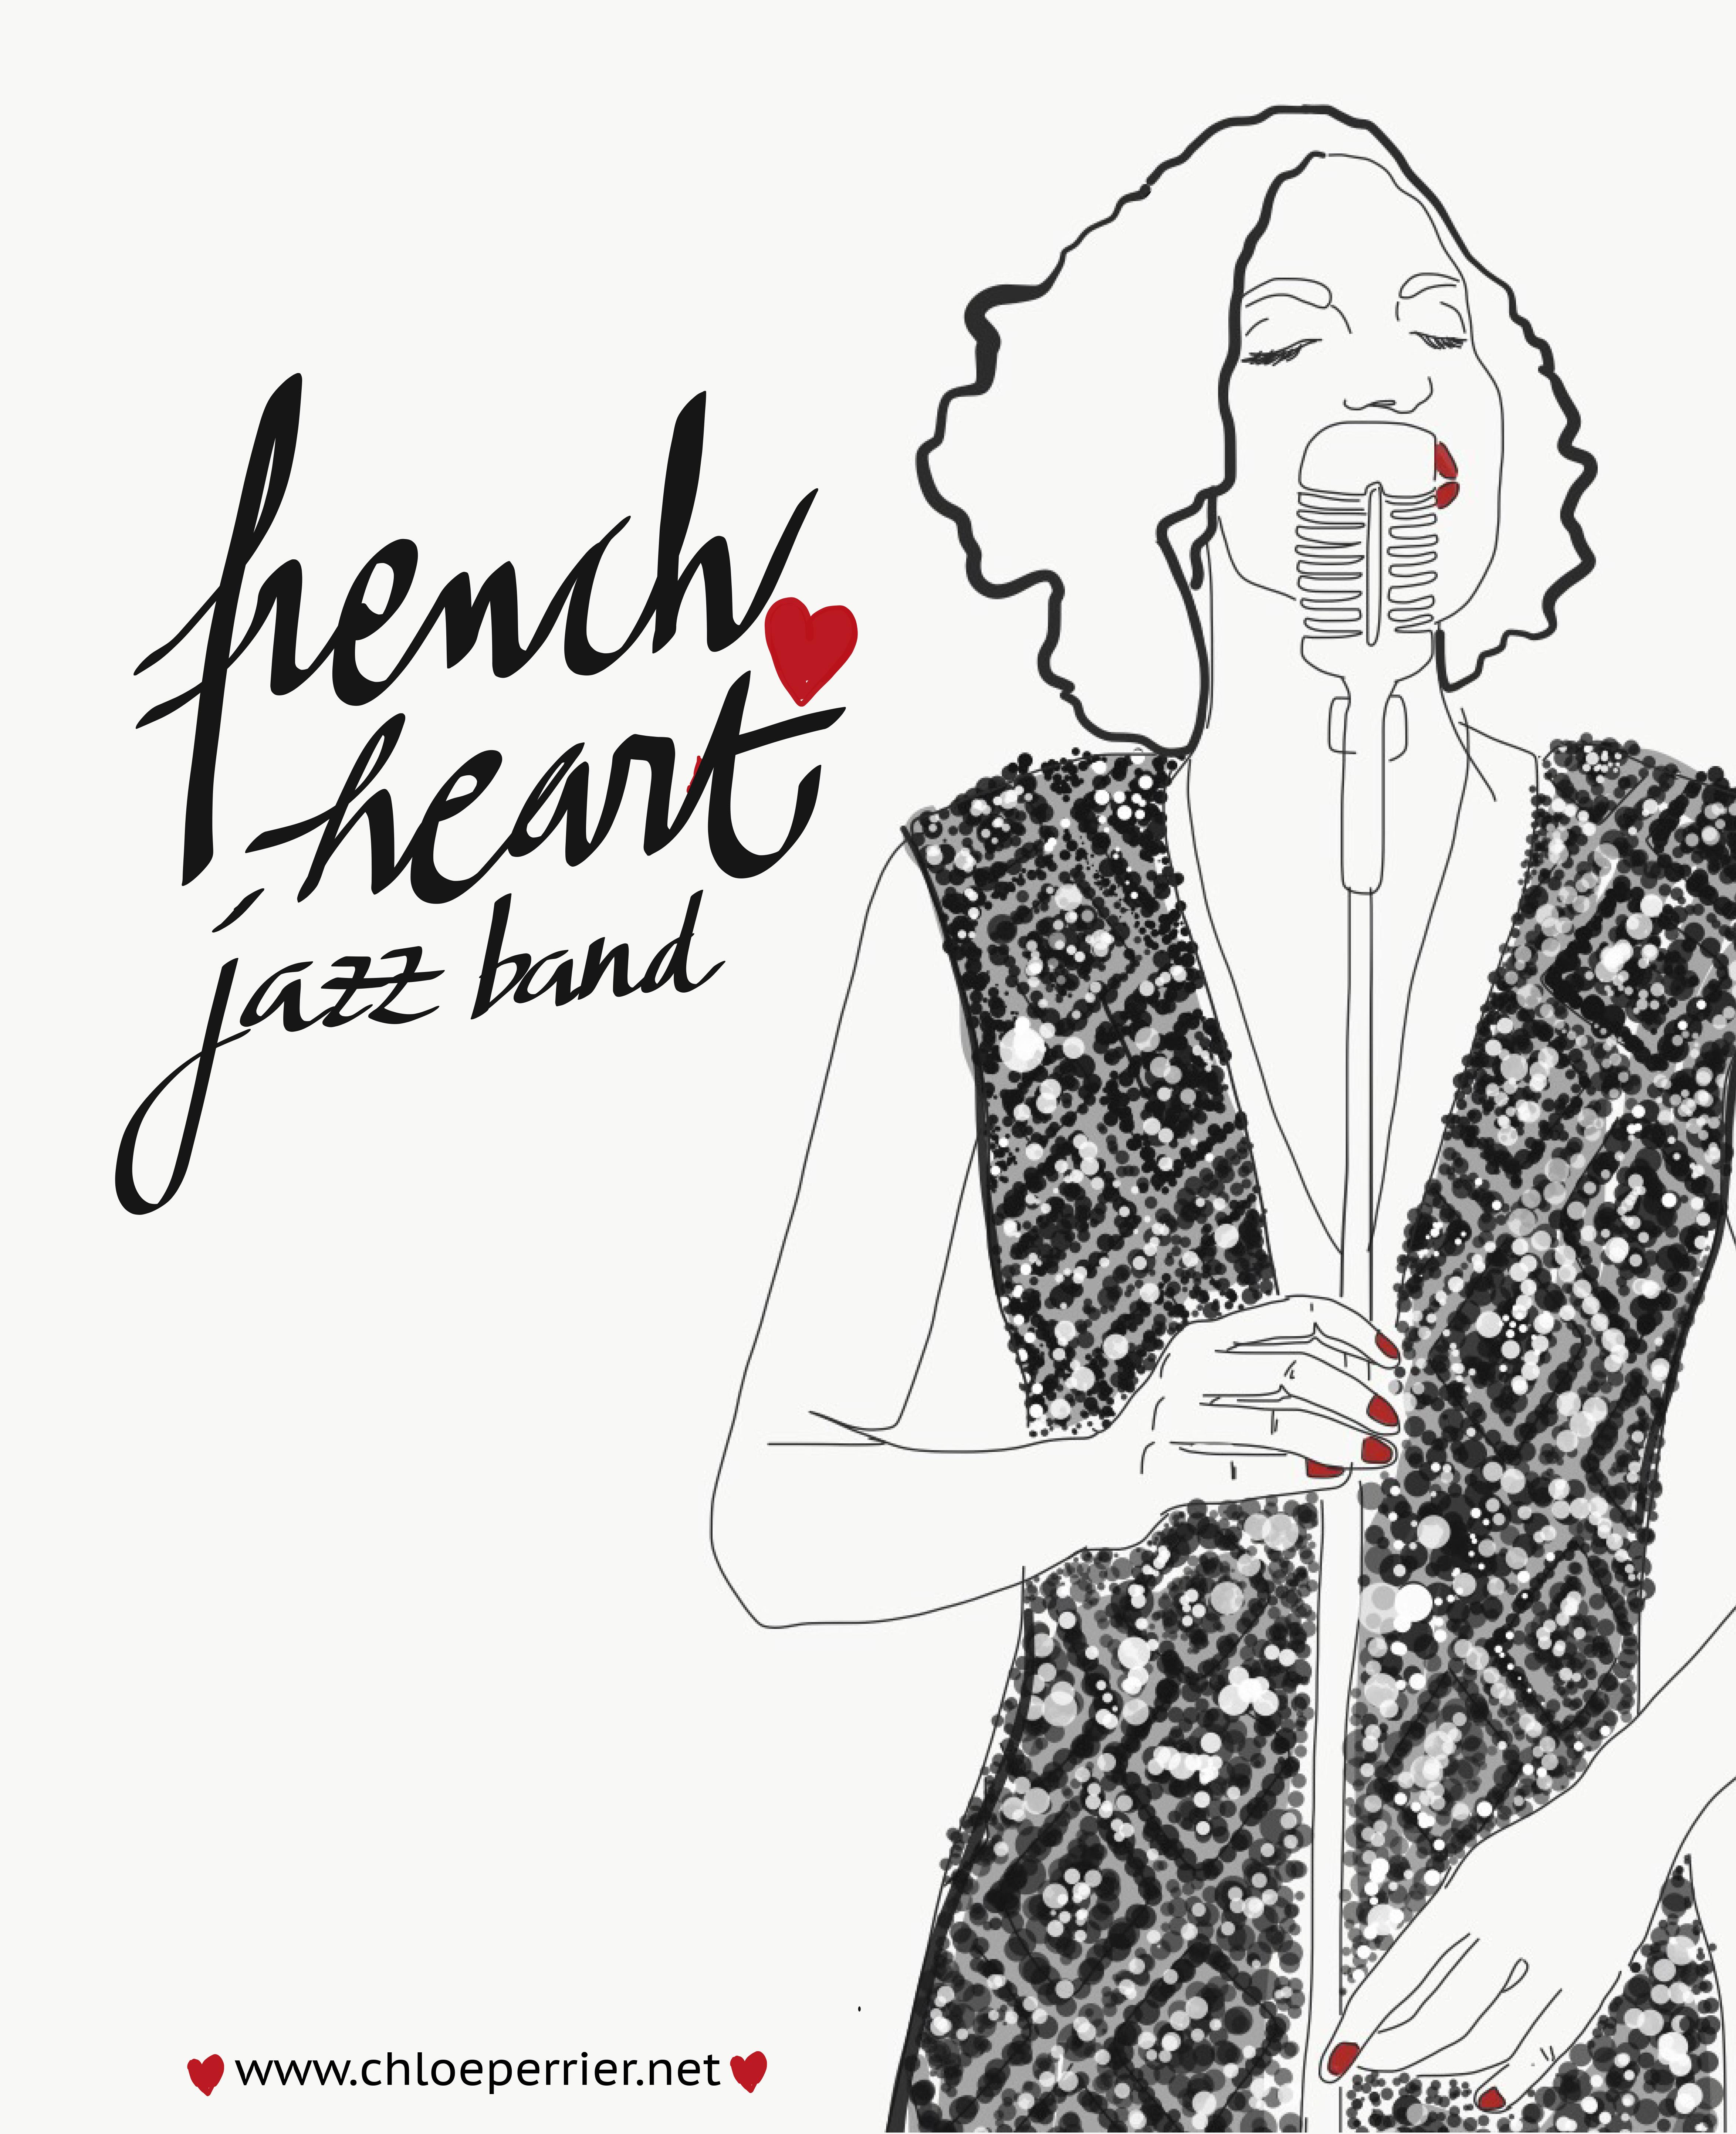 French Heart Jazz Band.jpeg